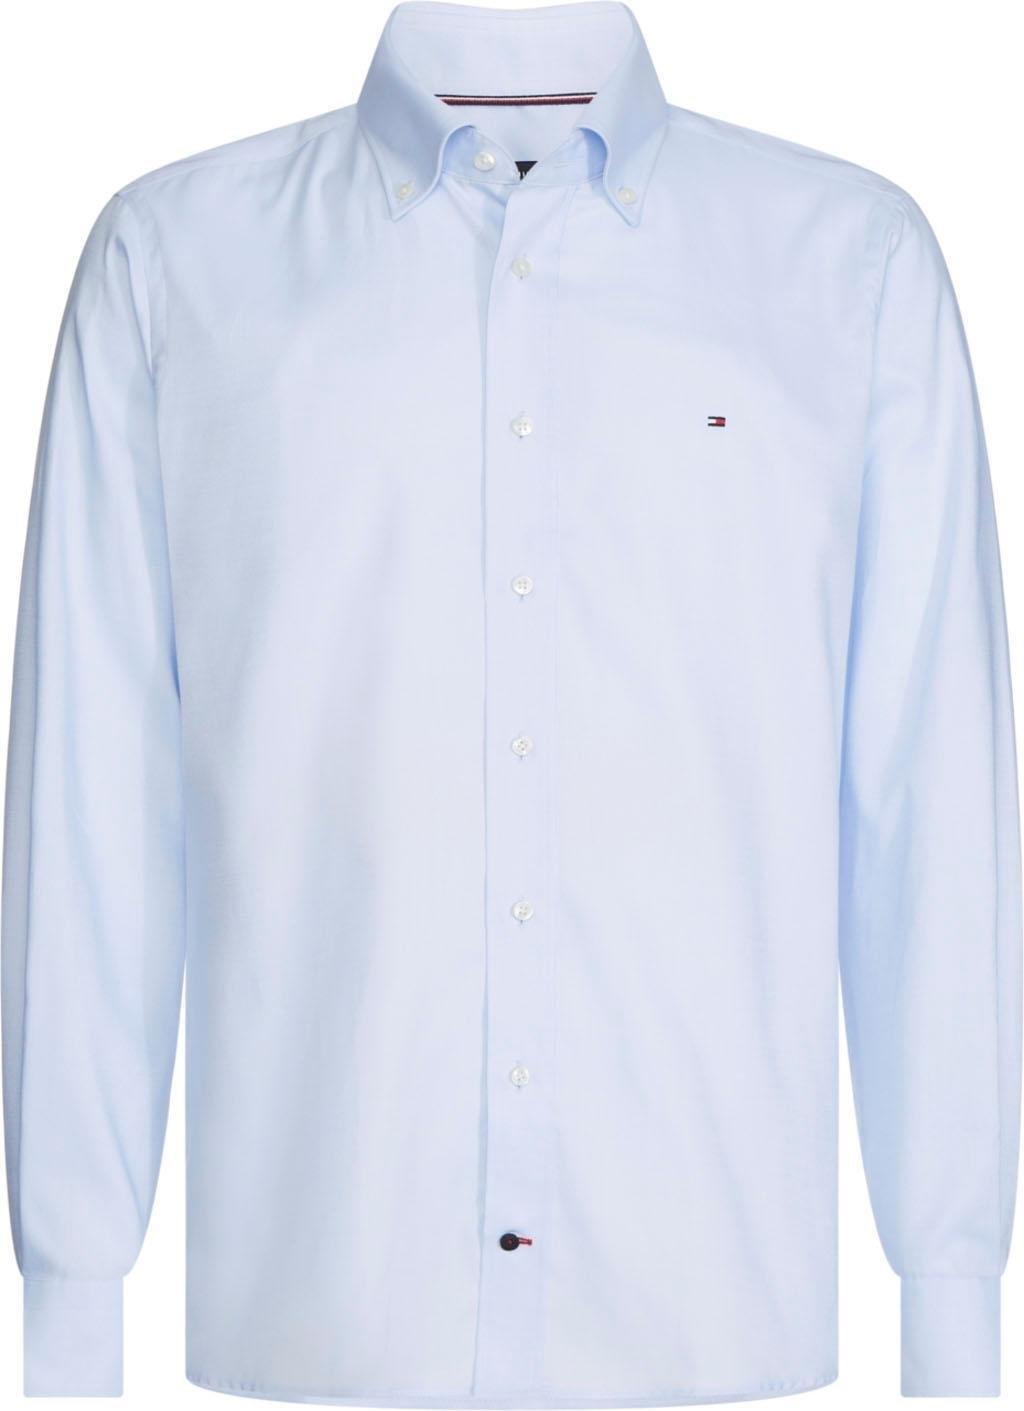 TOMMY HILFIGER TAILORED businessoverhemd nu online kopen bij OTTO